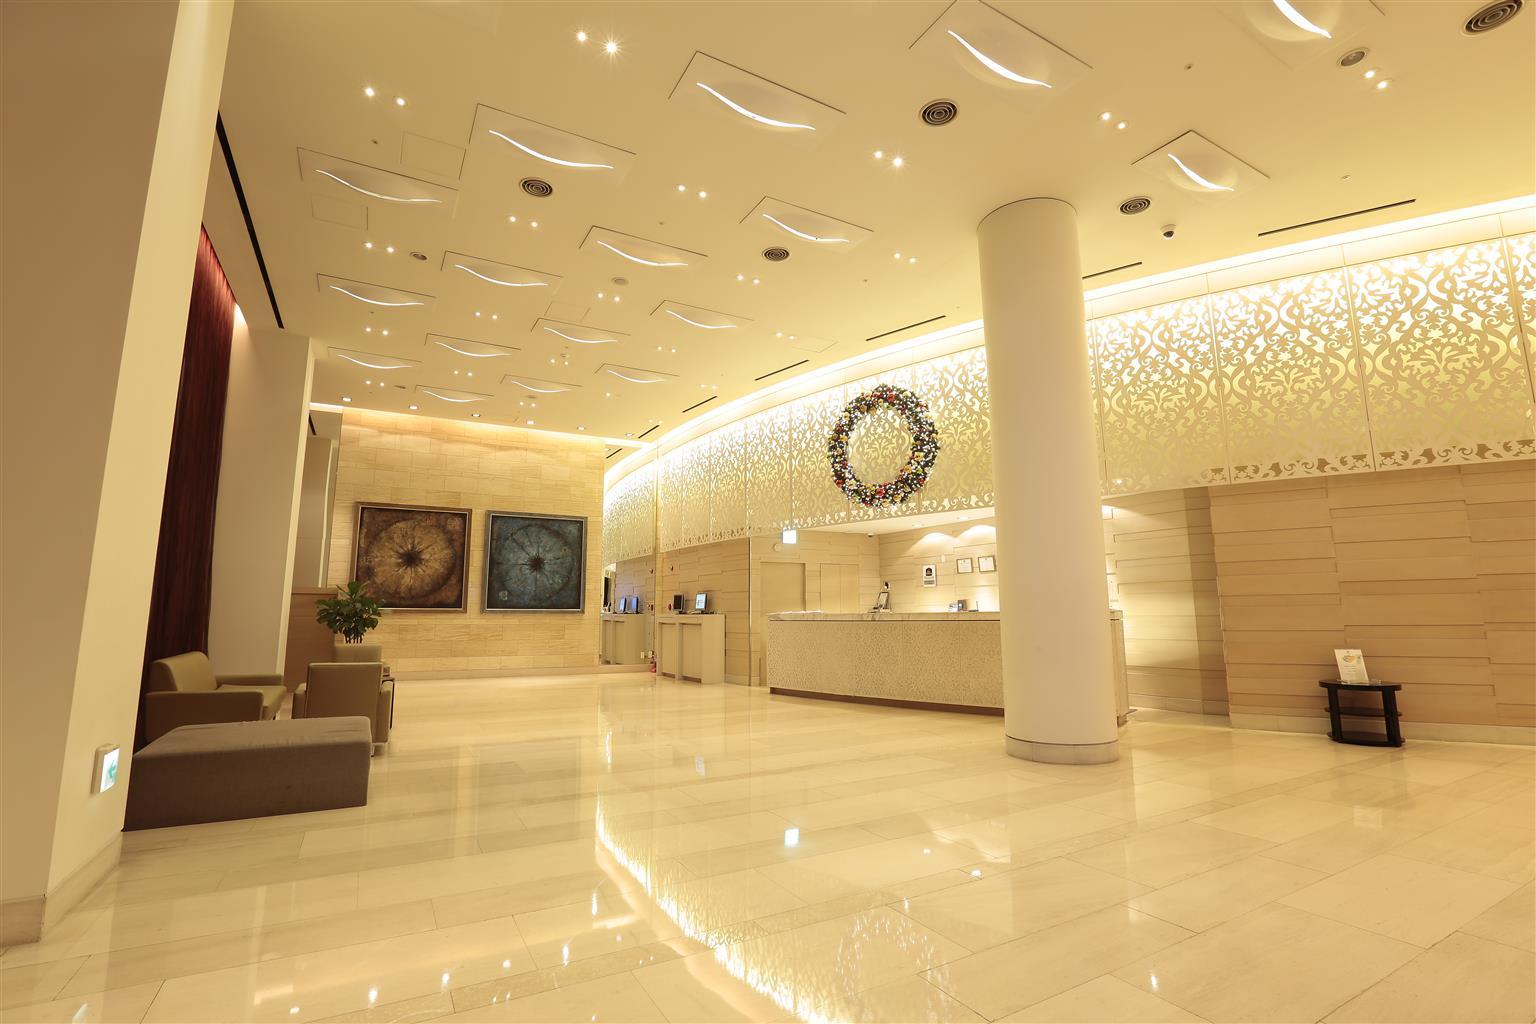 Book best western premier hotel kukdo seoul south korea hotels com - 99512_000_exterior 99512_001_exterior 99512_002_lobby 99512_003_businesscenter 99512_004_guestroom 99512_005_guestroom 99512_006_guestroom